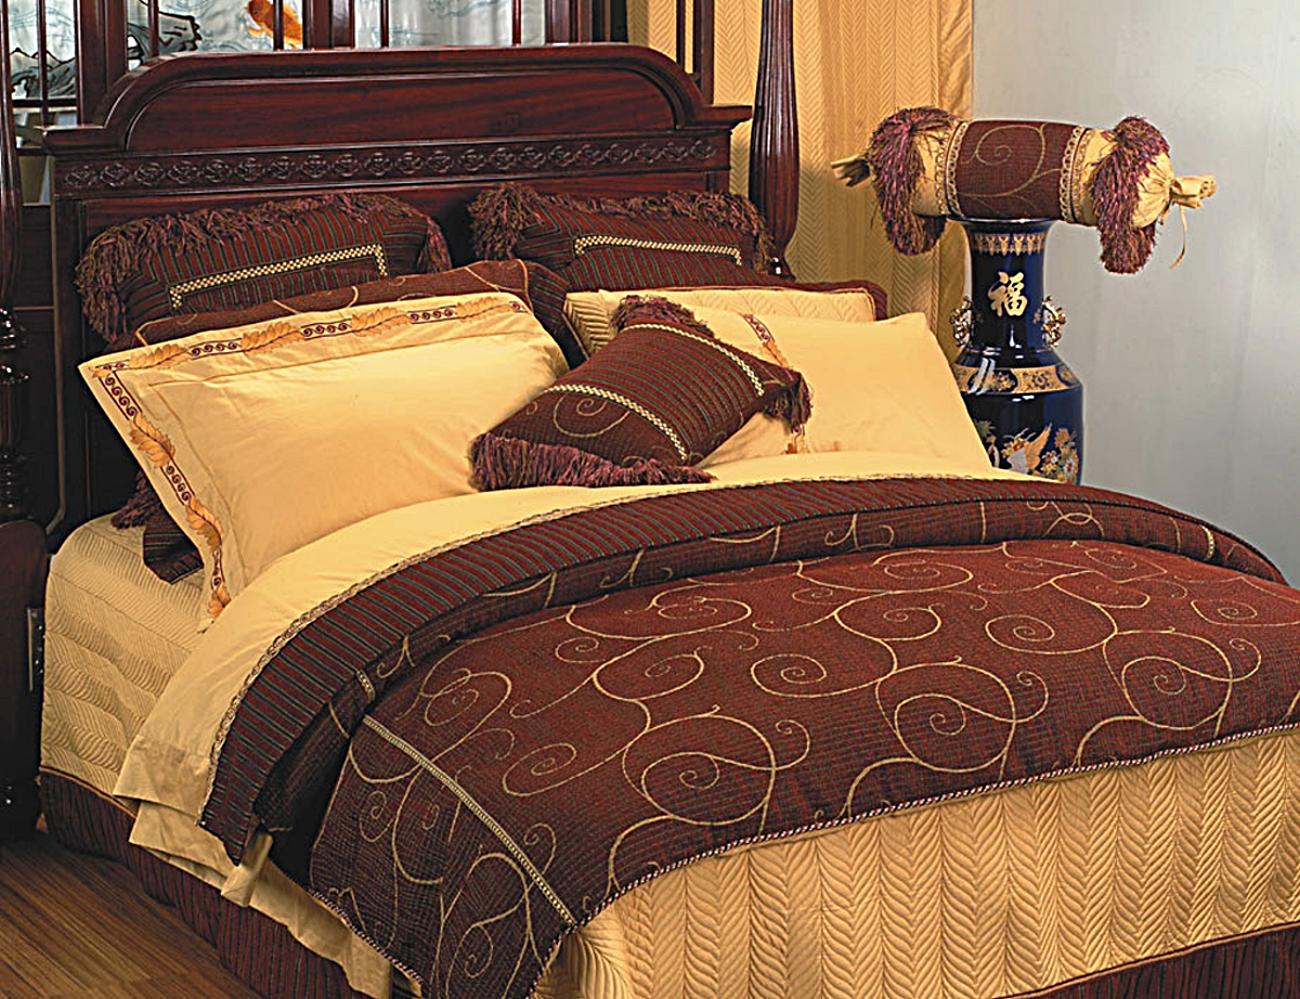 Modern Designs Of Bed Sheets - Home Design Elements